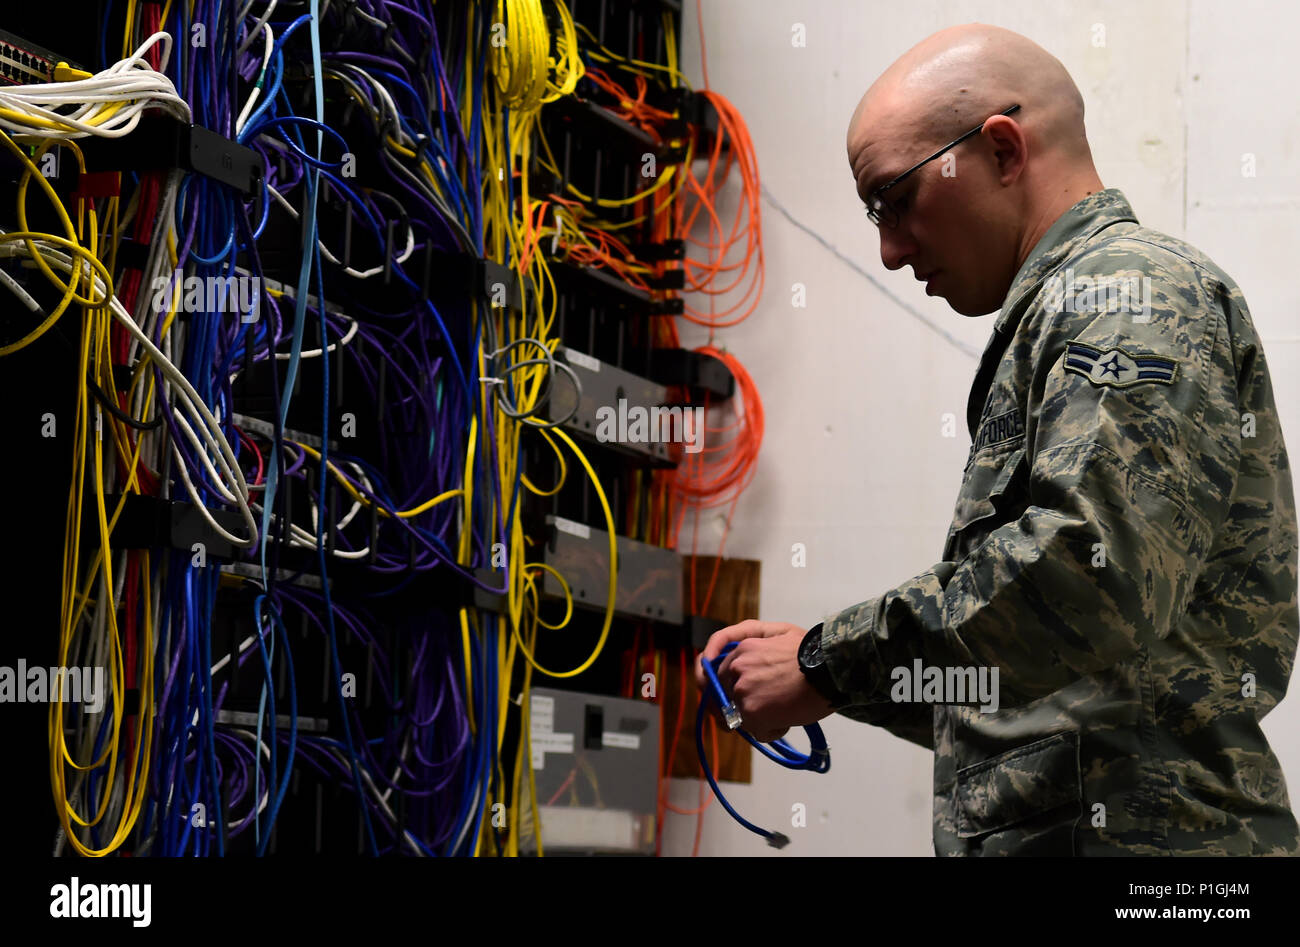 hight resolution of airman 1st class michael de la mater 460th space communication squadron network technician changes out an ethernet cable inside a communications closet